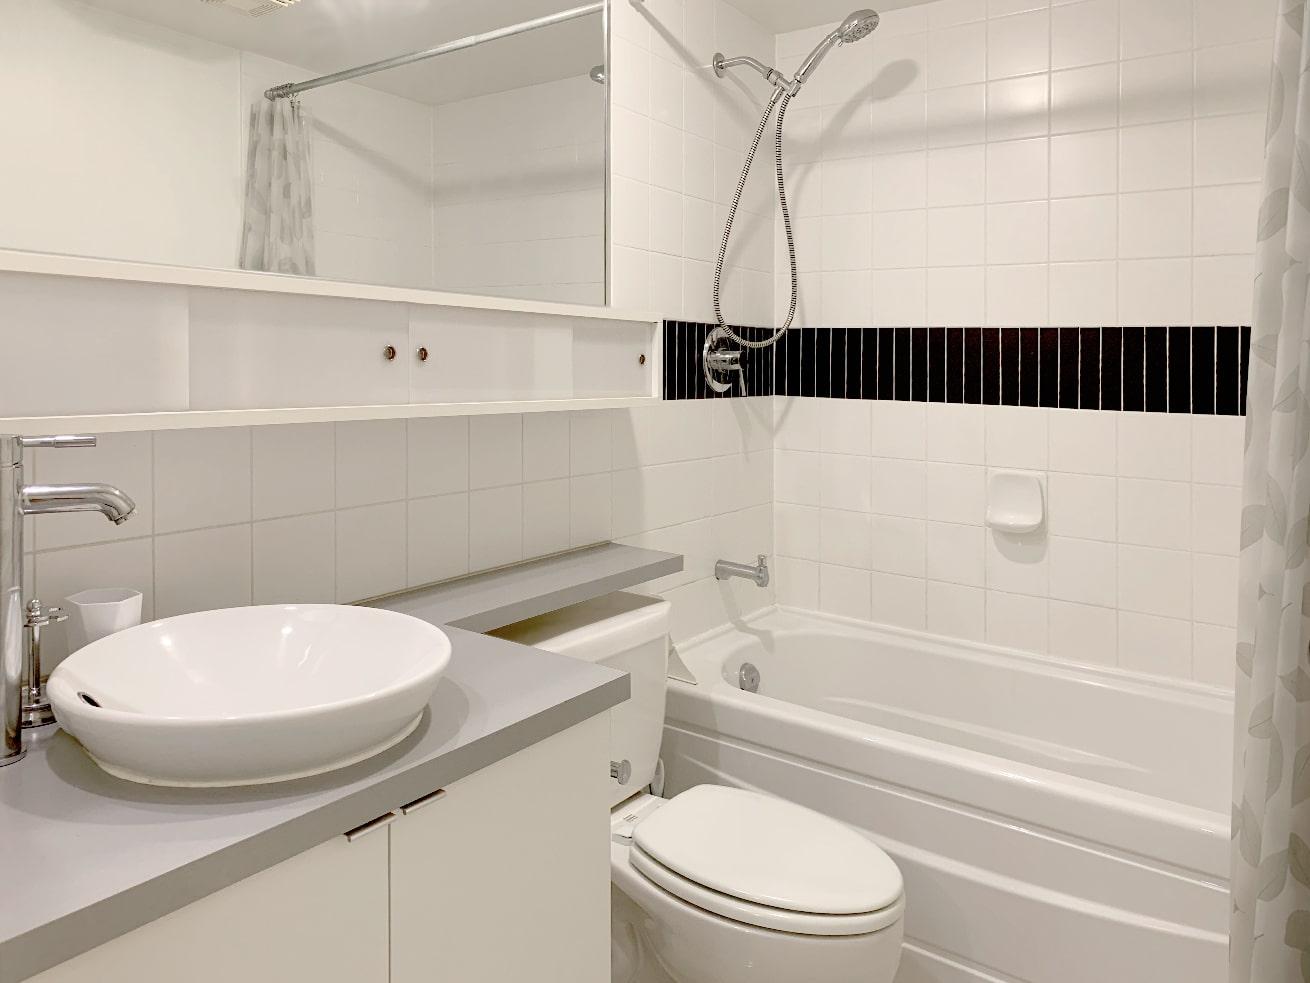 Yaletown apartment rentals max studio den bathroom